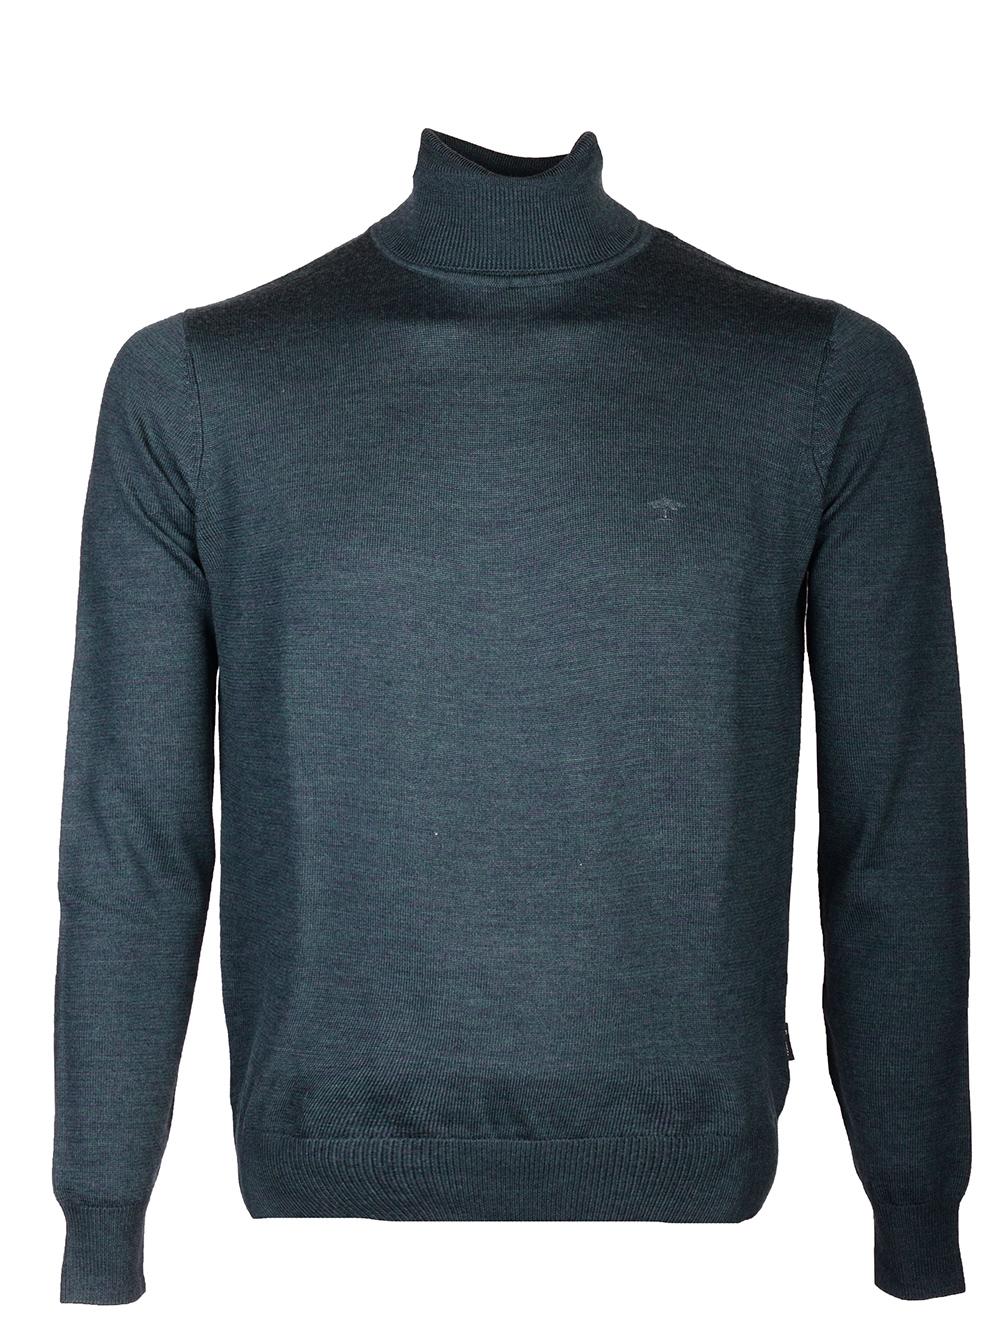 FYNCH-HATTON Μπλούζα ζιβάγκο 1219 852-766 ΚΥΠΑΡΙΣΙ